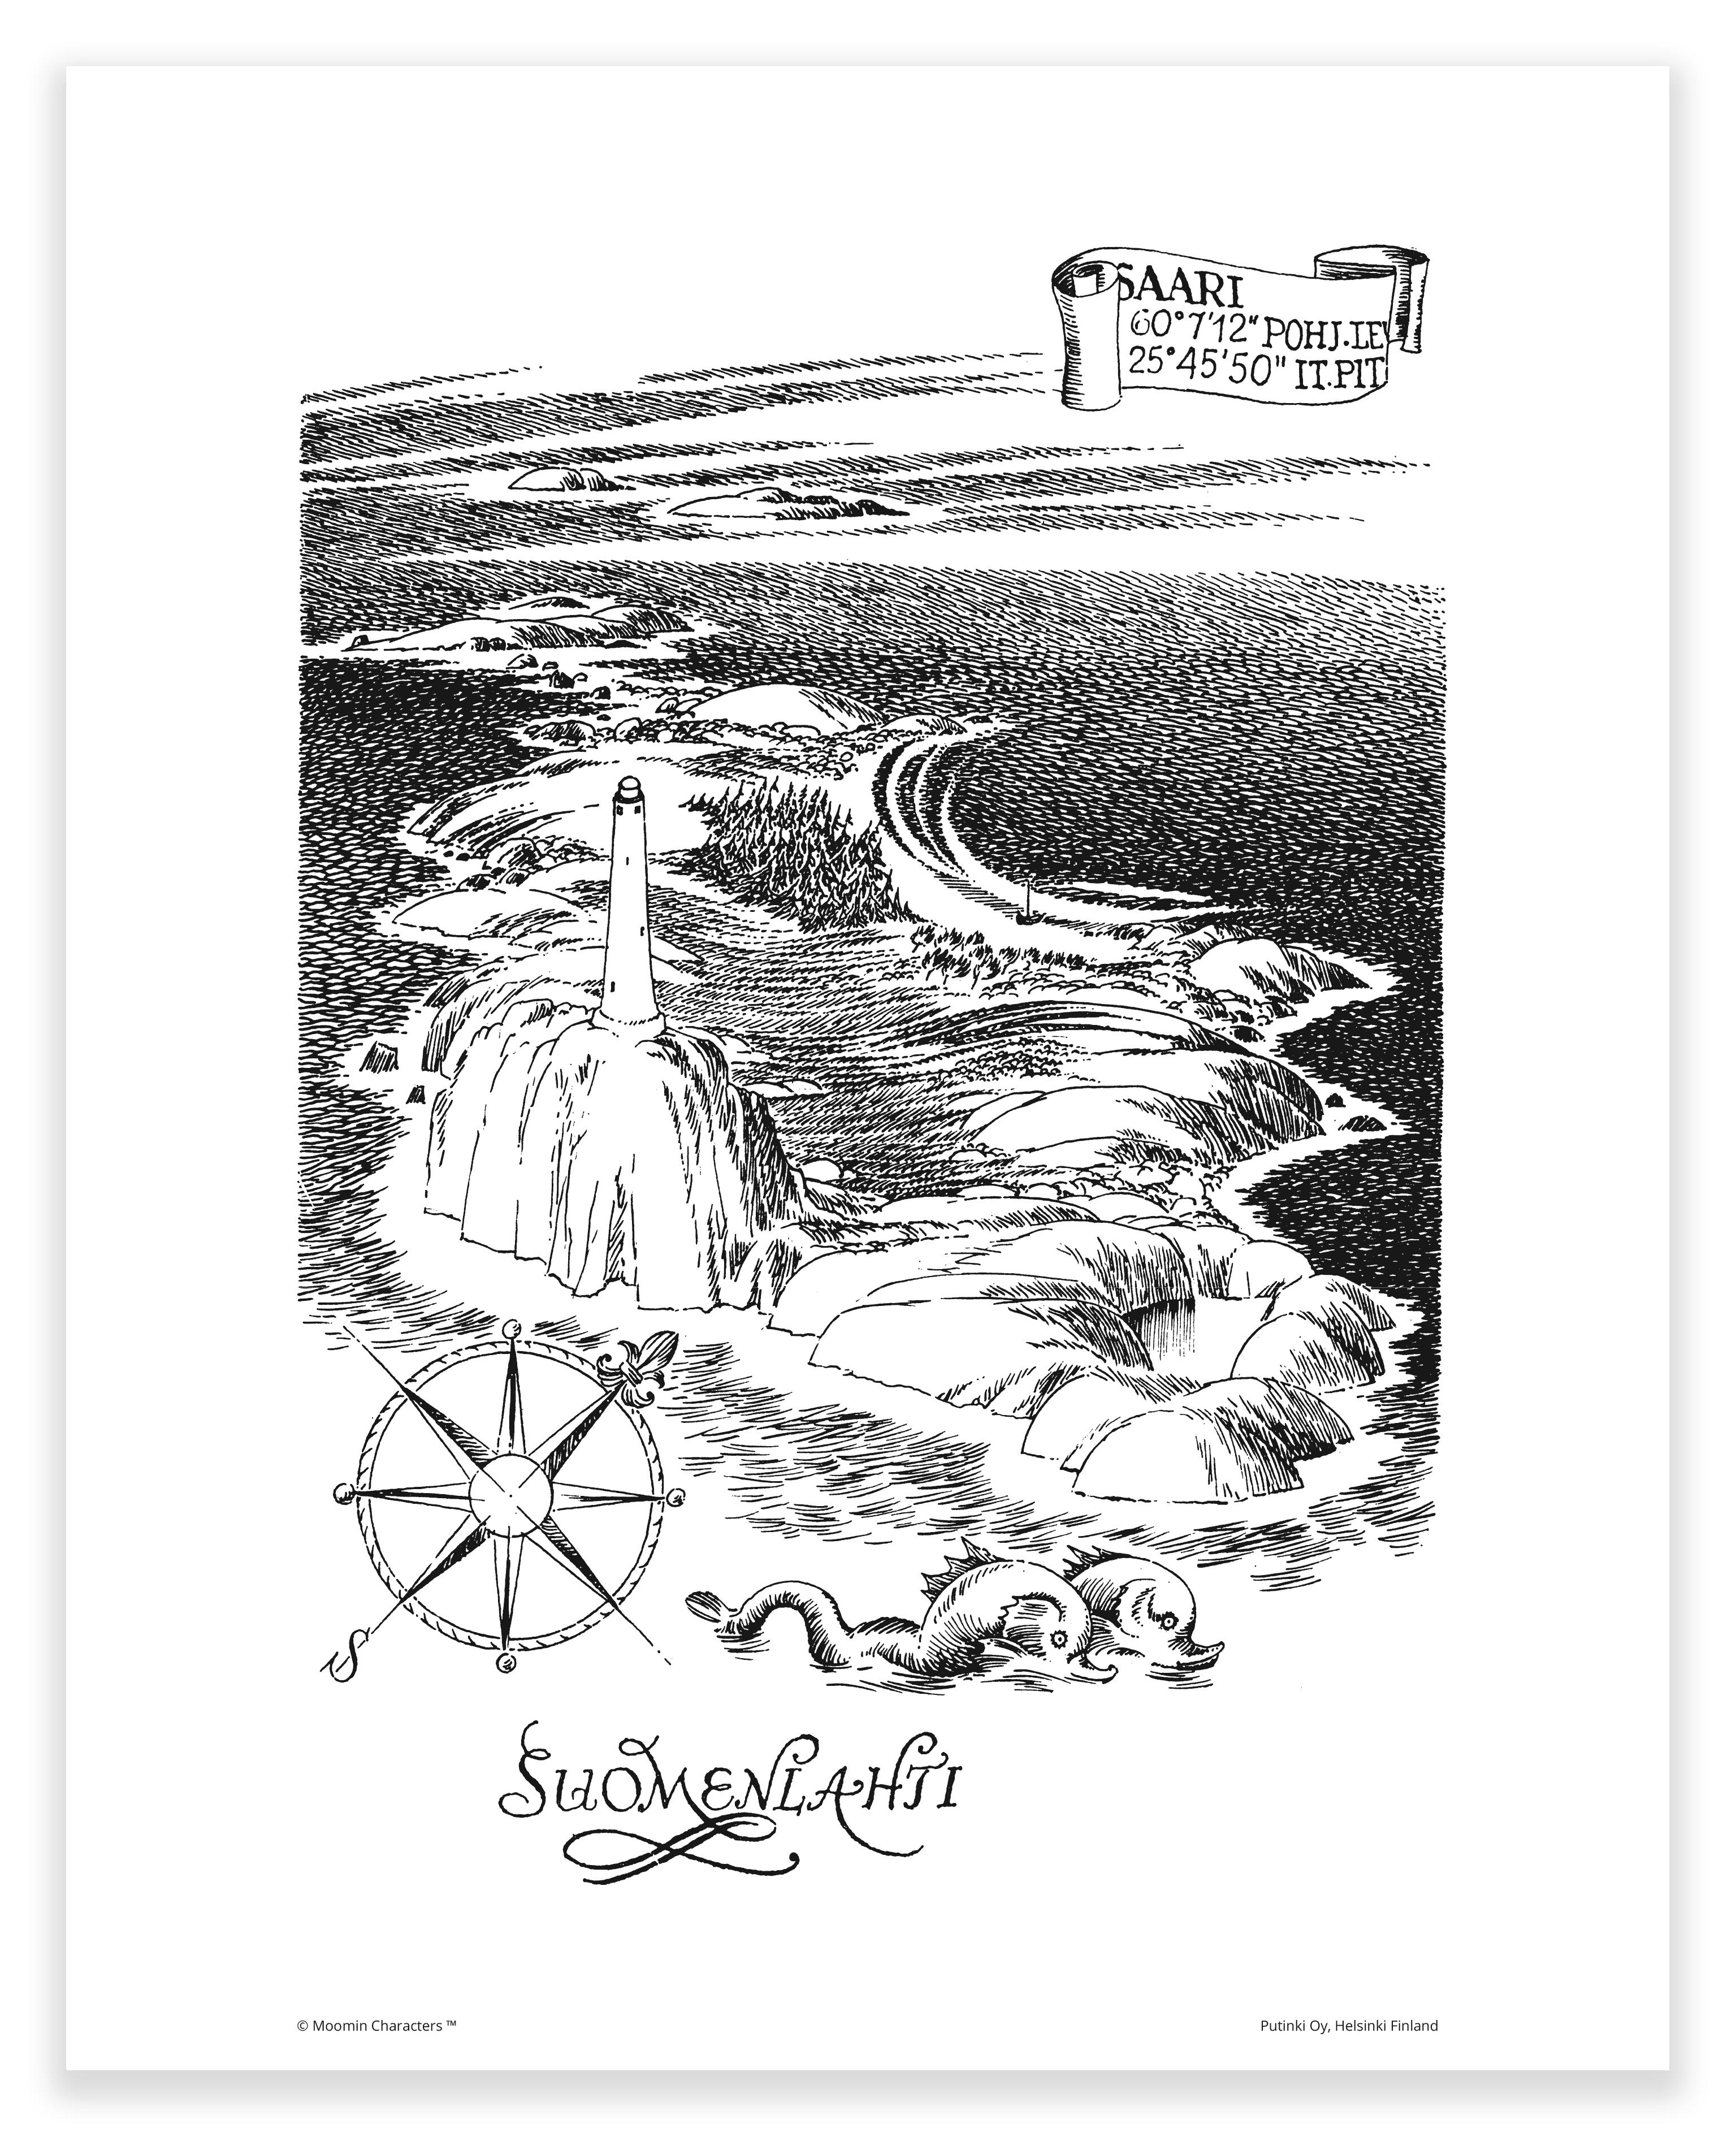 Putinki Poster Suomenlahti